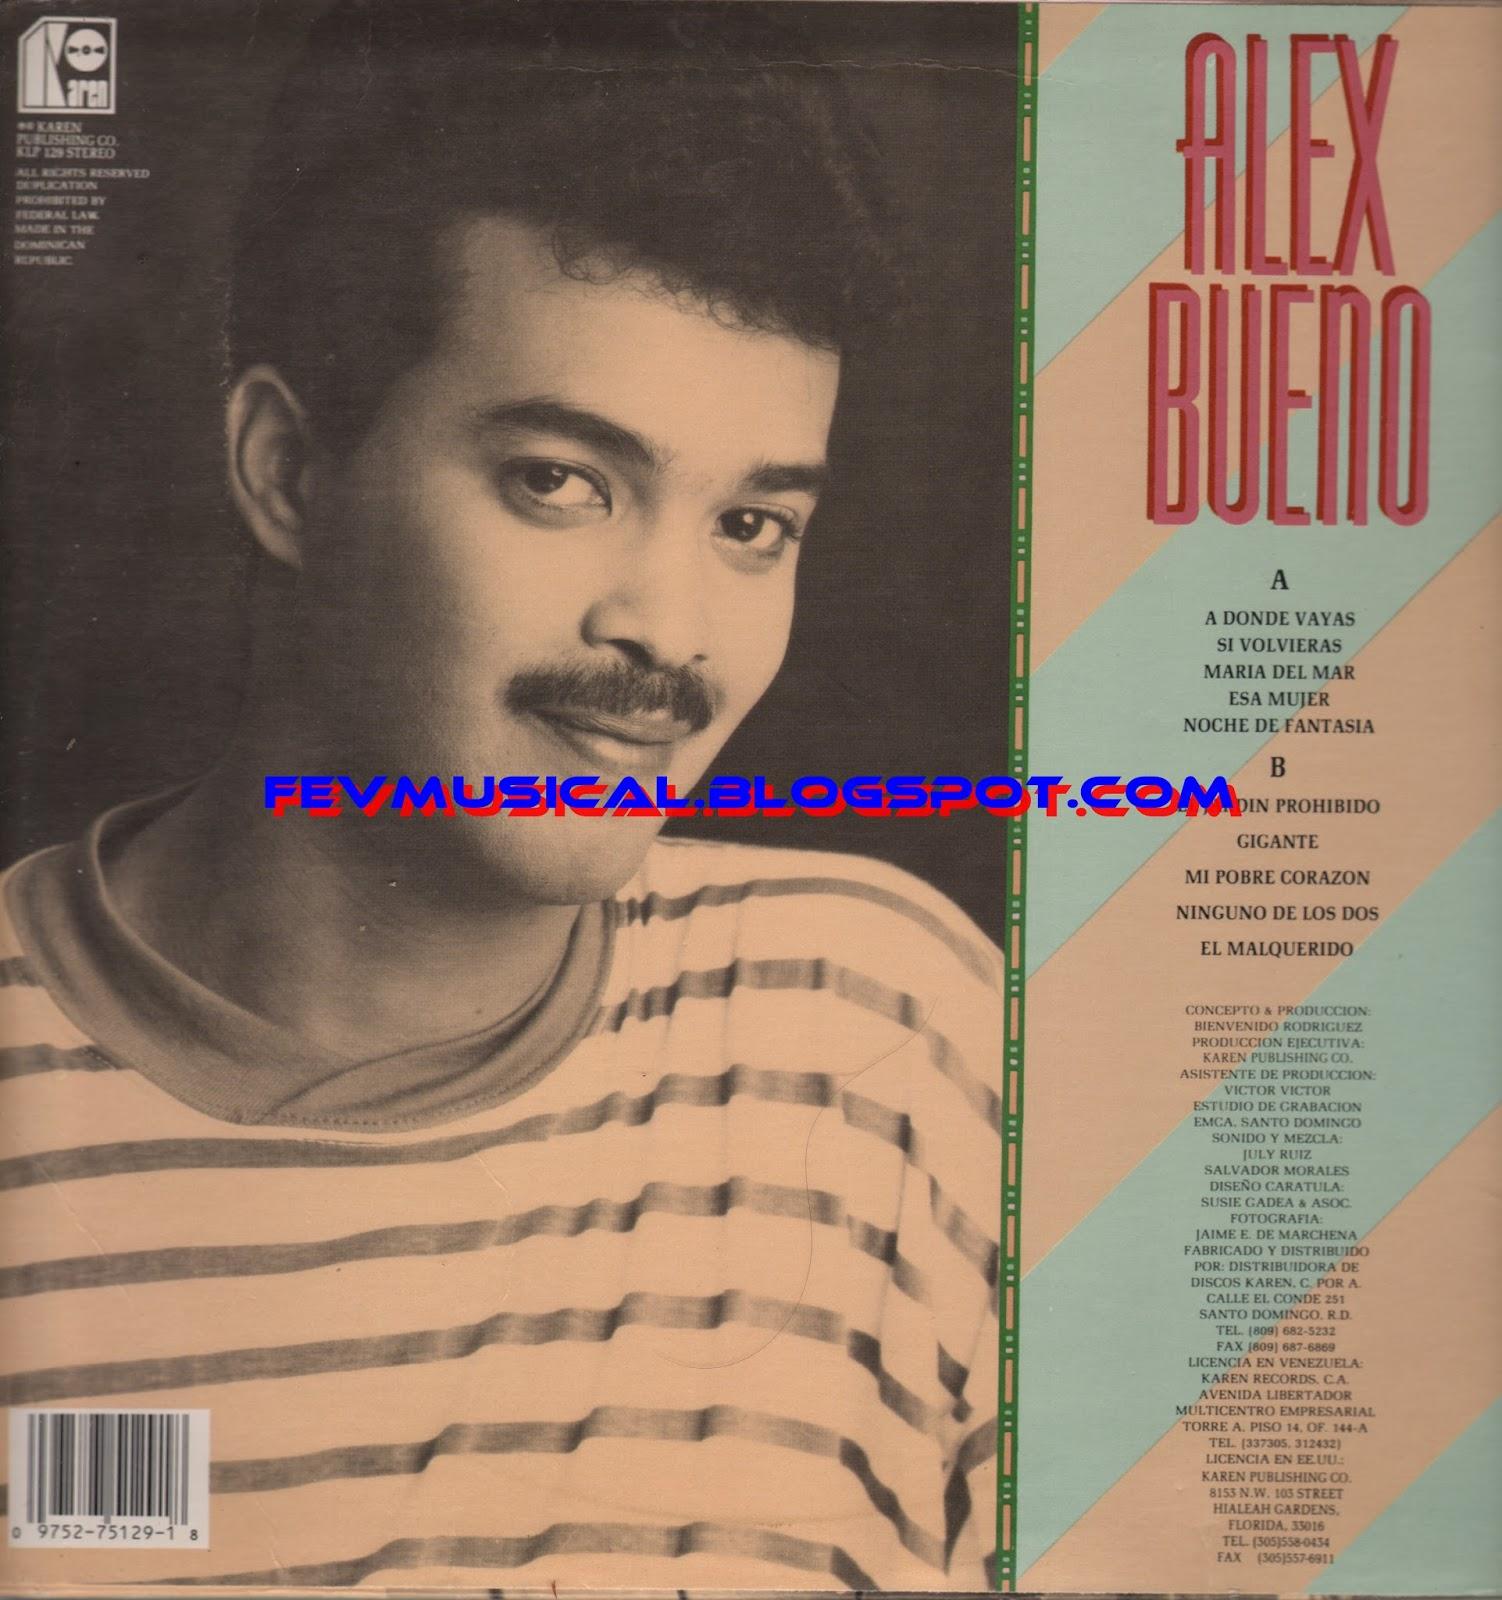 Fev musical 1990 alex bueno karen for Alex el bueno jardin prohibido